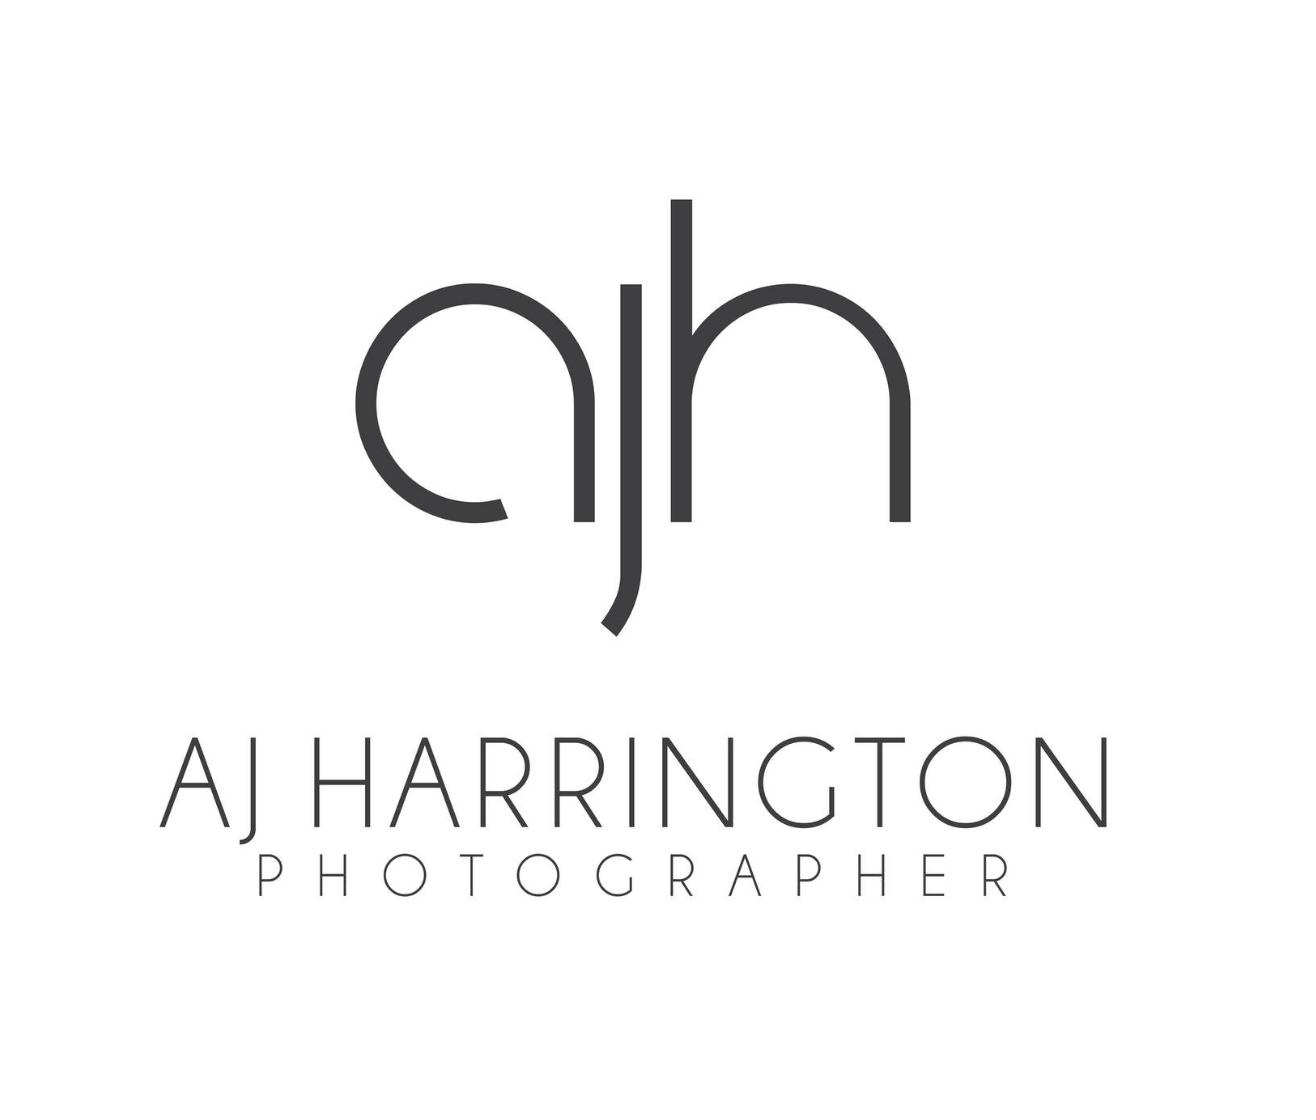 aj_harrington_photography.png